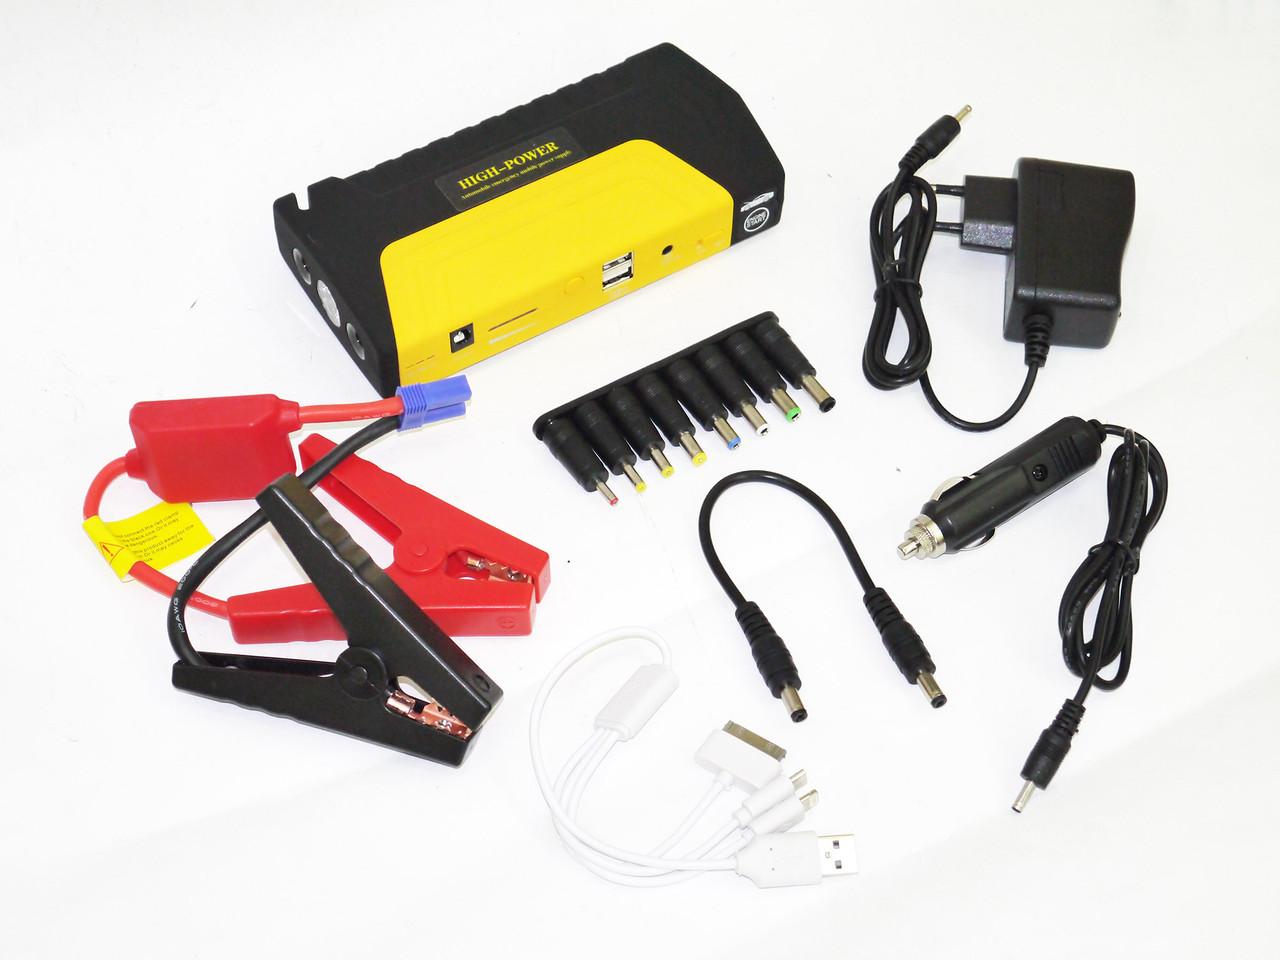 Car jump starter 16800mAh Power Bank зарядно пусковое устройство для машины 2хUSB+Фонарик